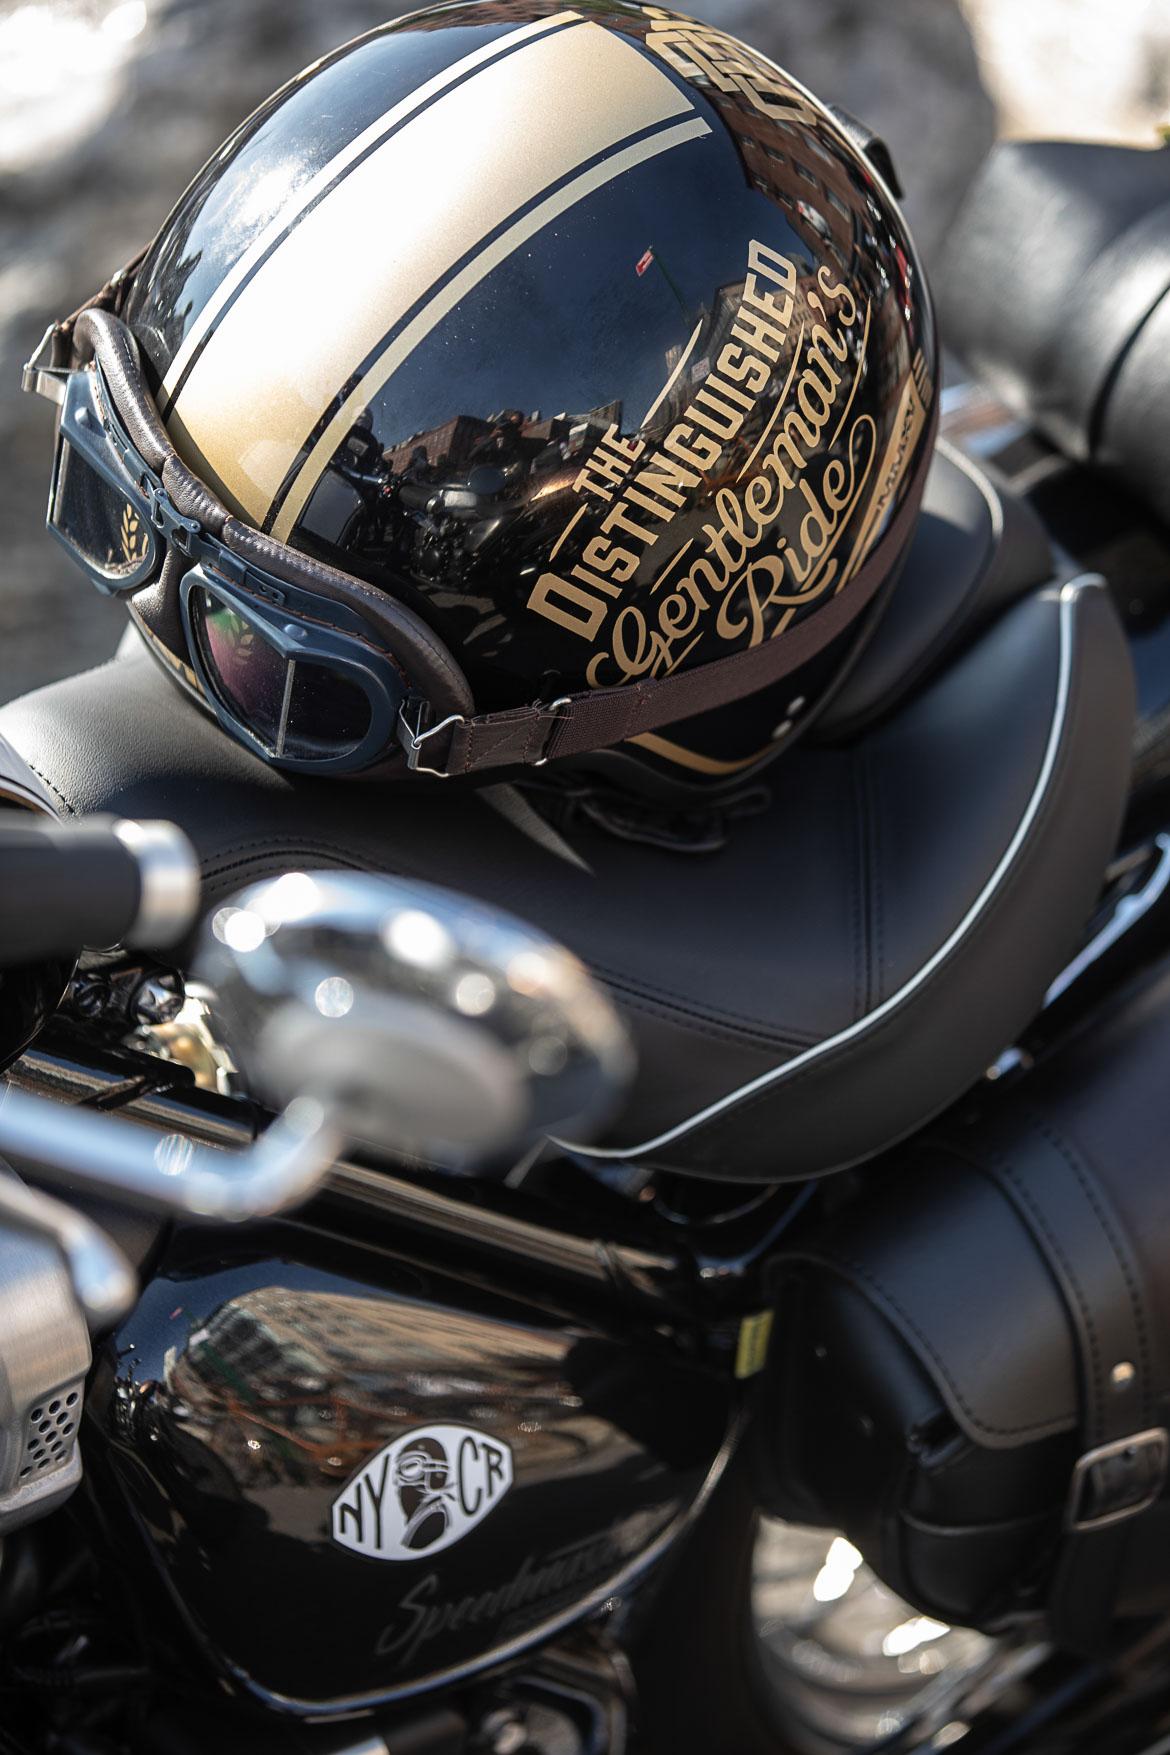 The Distinguished Gentleman's Ride